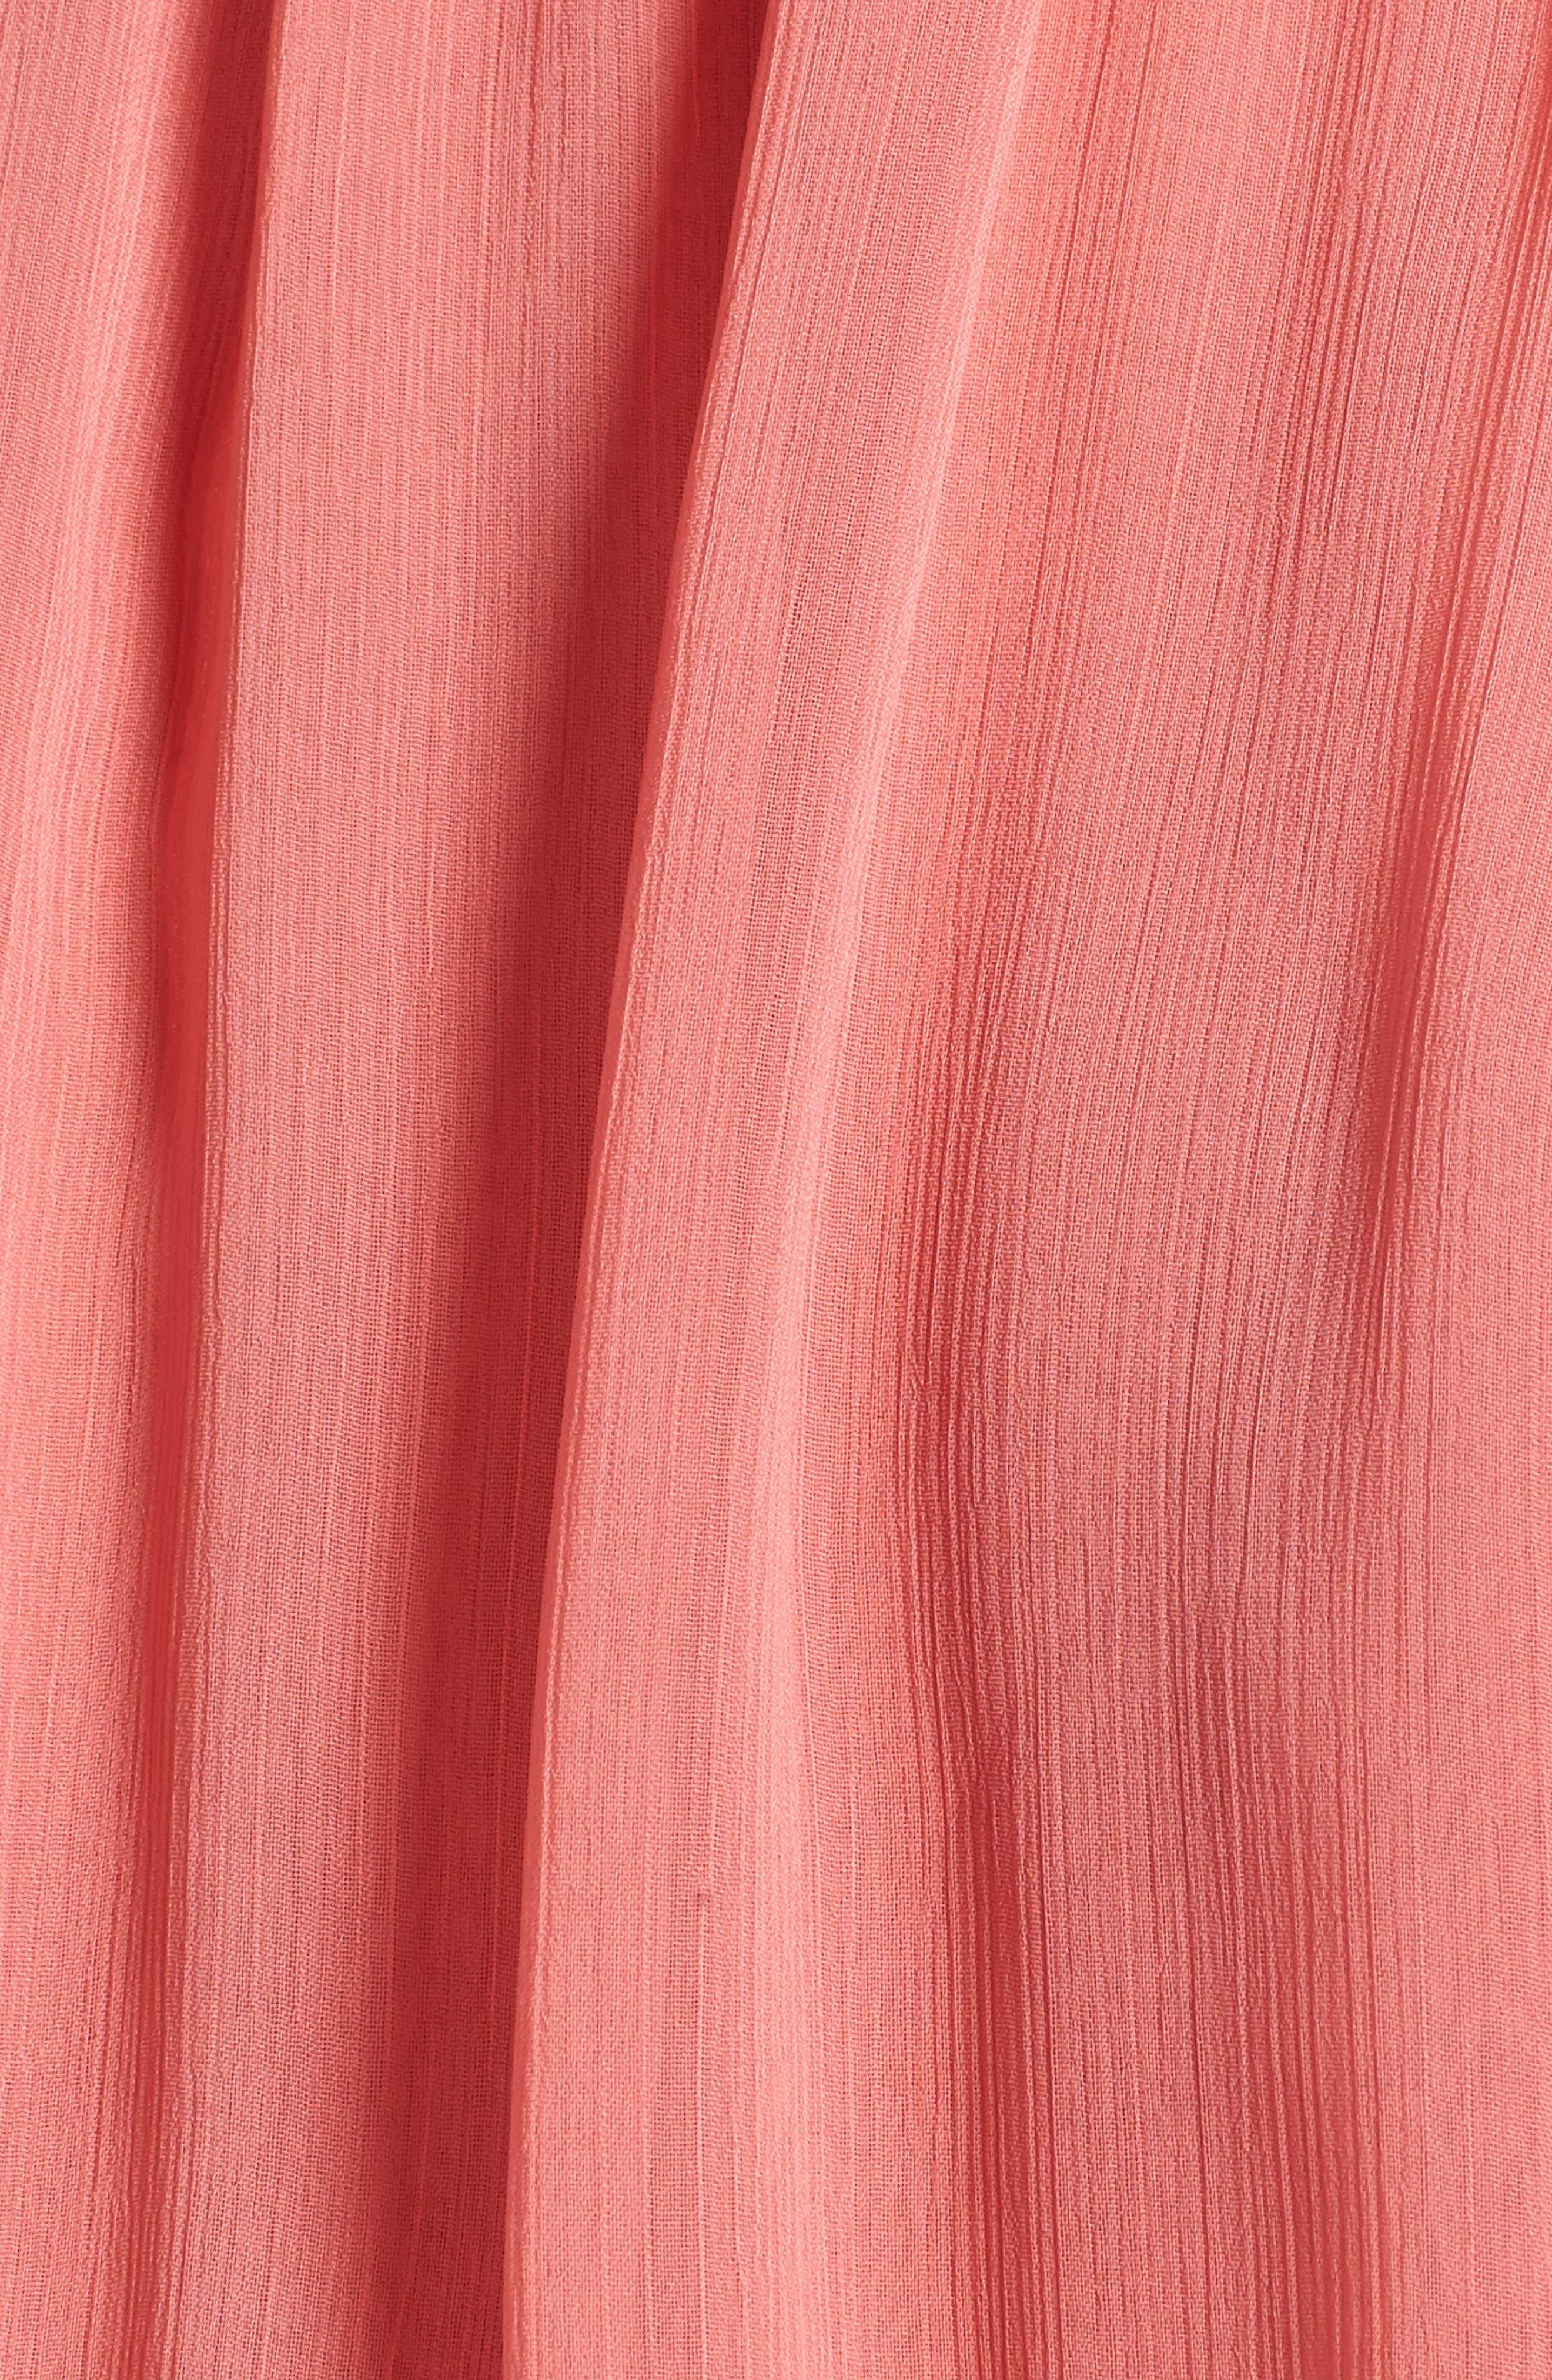 Ruffle Chiffon Blouse,                             Alternate thumbnail 5, color,                             Coral Rose Tea